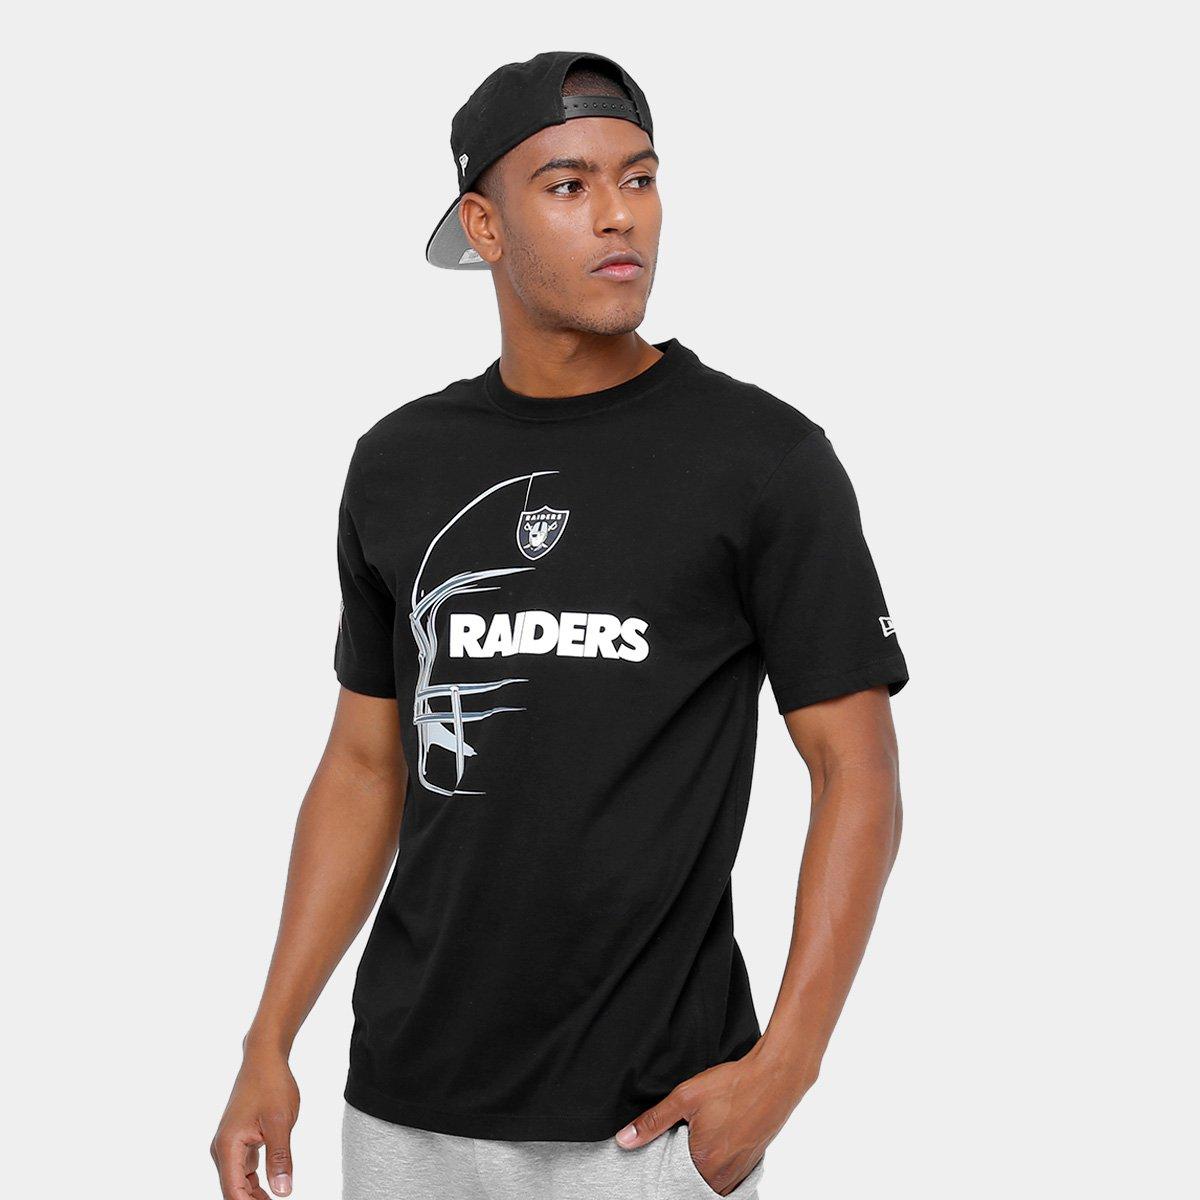 08baf40e41122 Camiseta Oakland Raiders New Era Capacete Masculina - Compre Agora ...